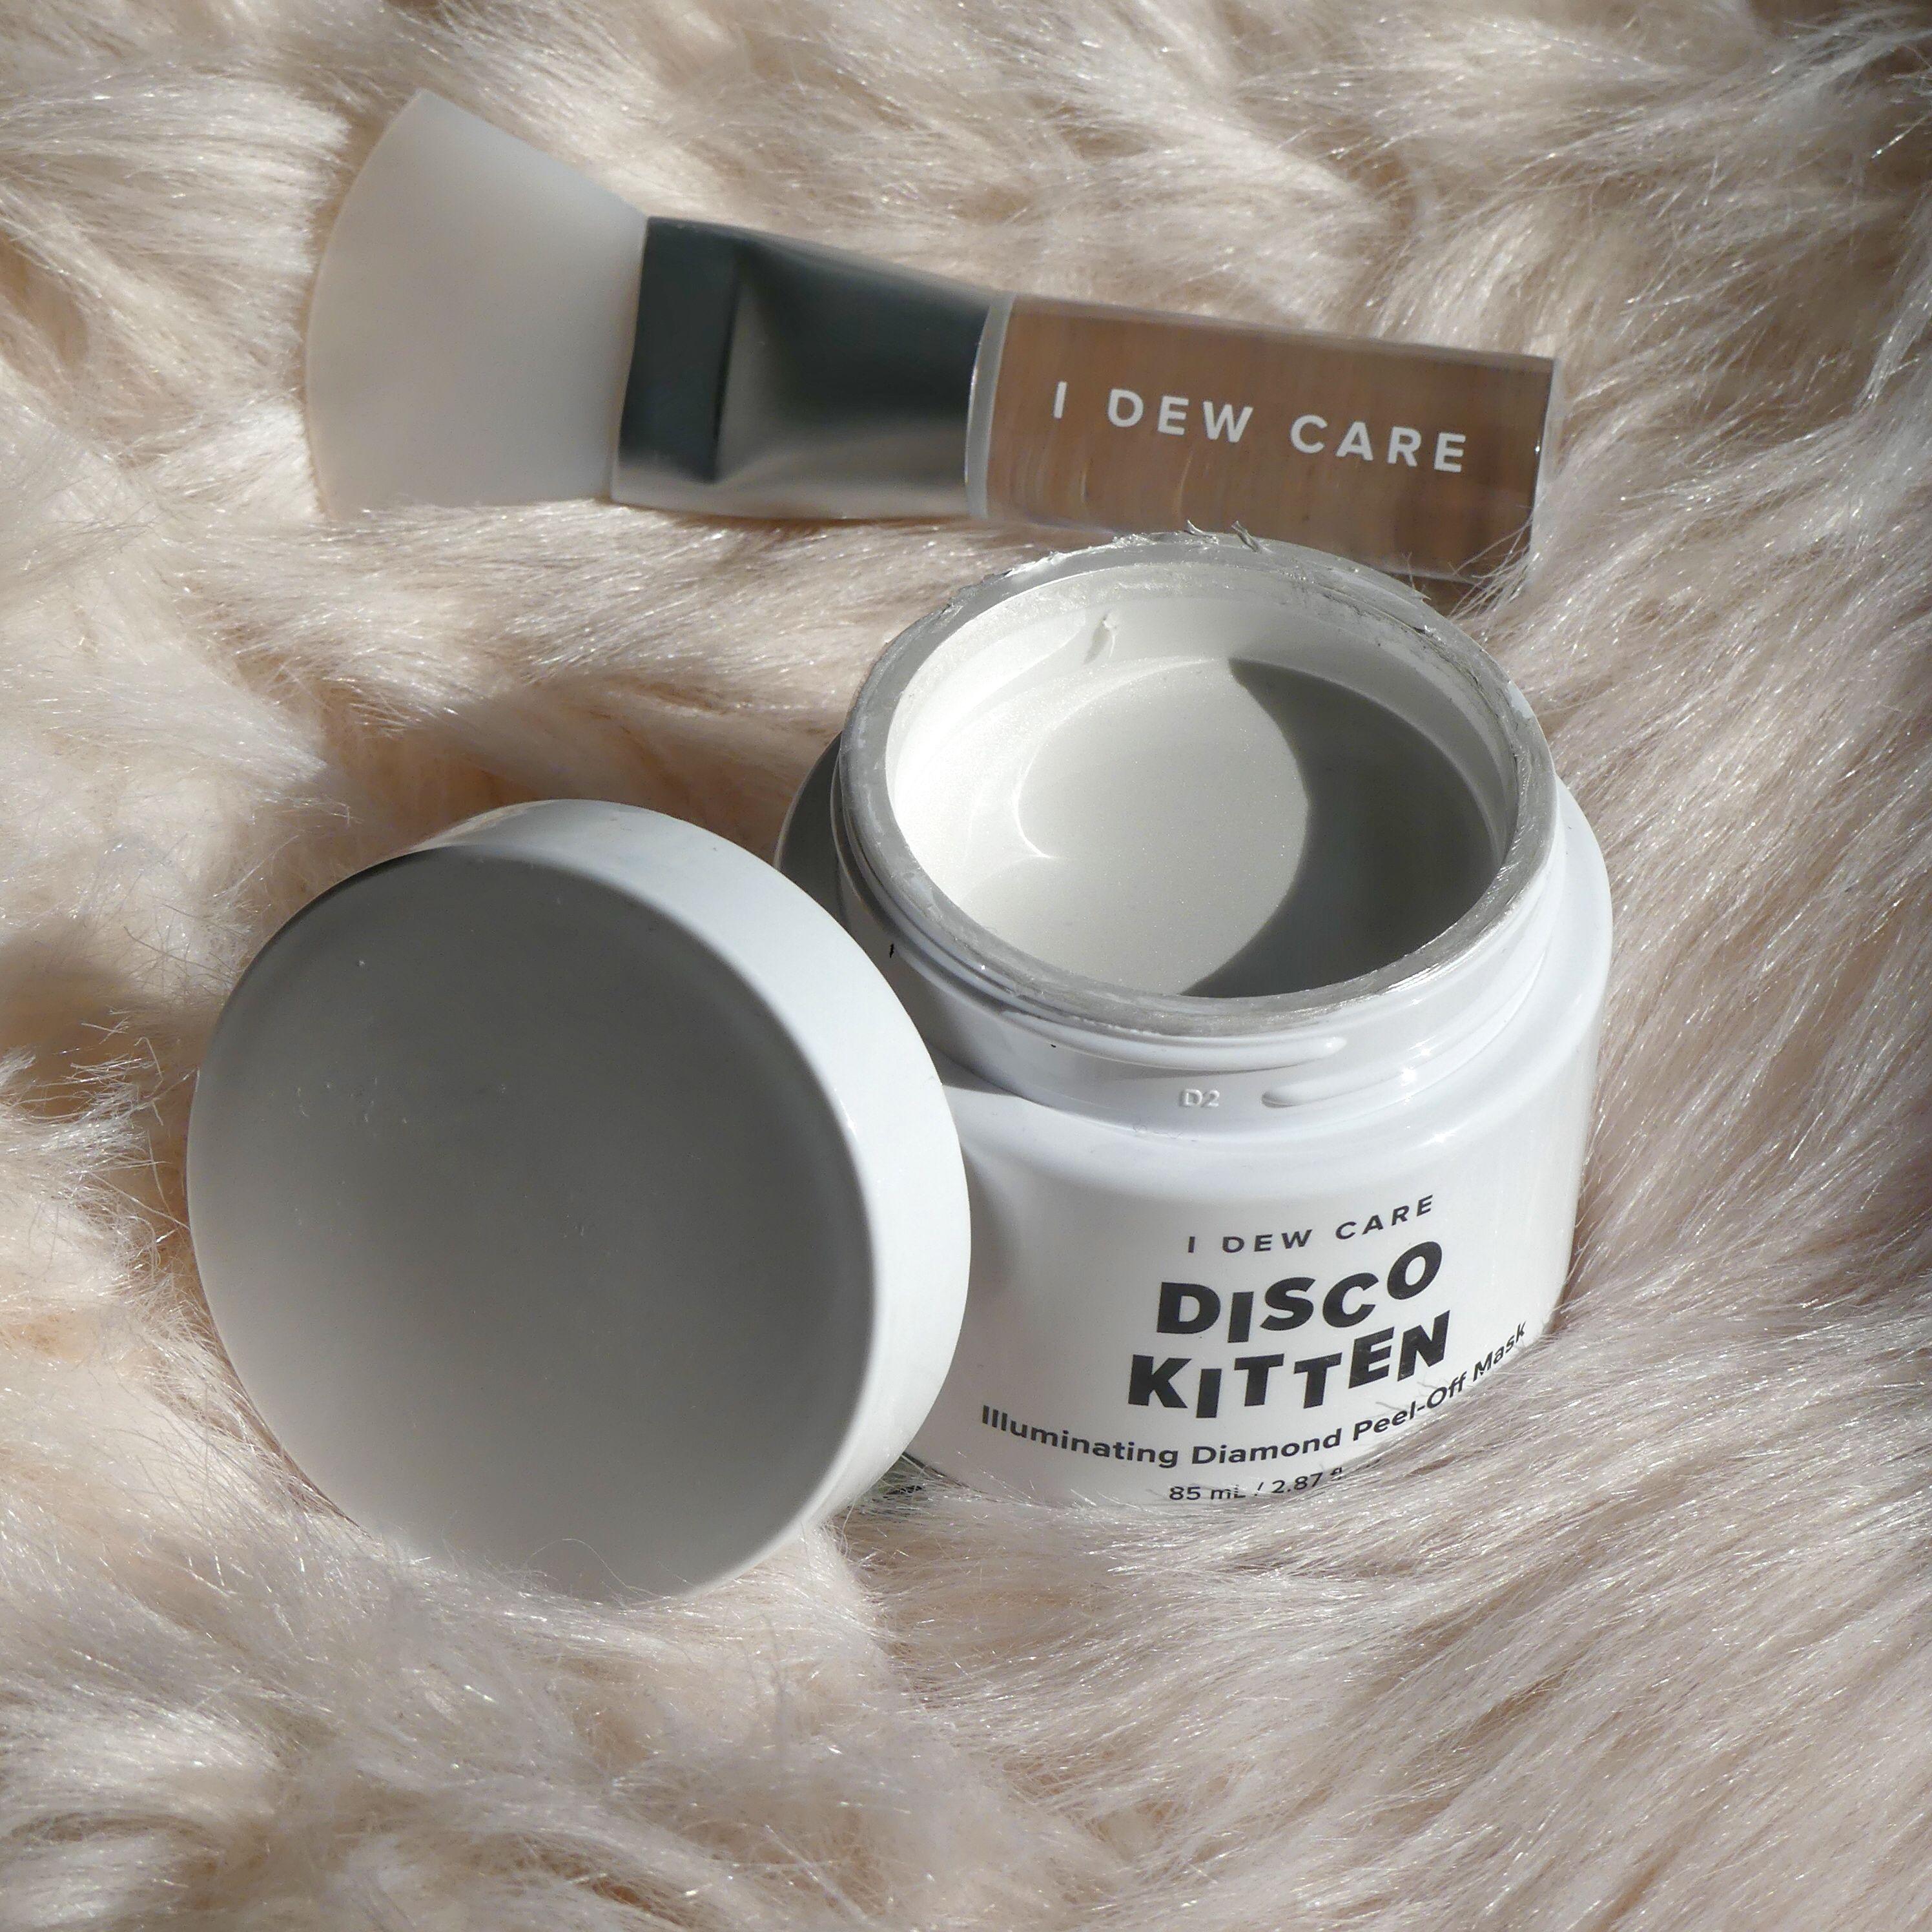 Idewcare S Disco Kitten Peel Off Mask Pearl Powder Peel Off Mask Disco